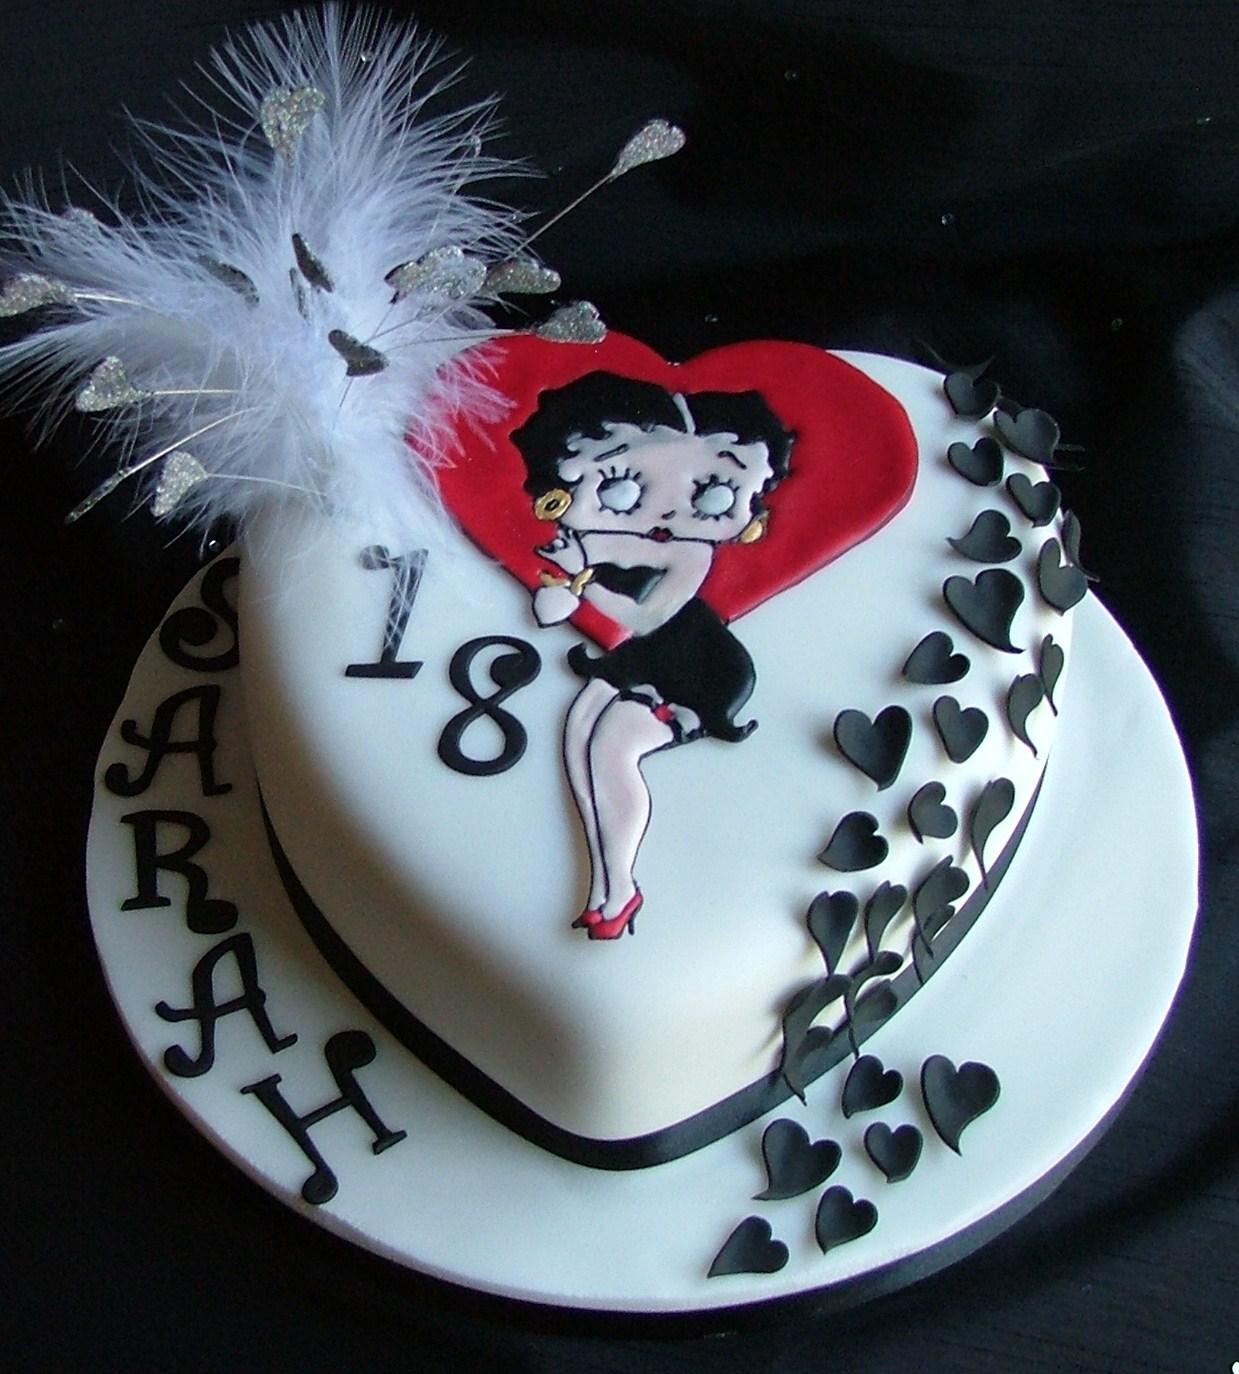 Stupendous Black Hearts Betty Boop Too Nice To Slice Personalised Birthday Cards Veneteletsinfo